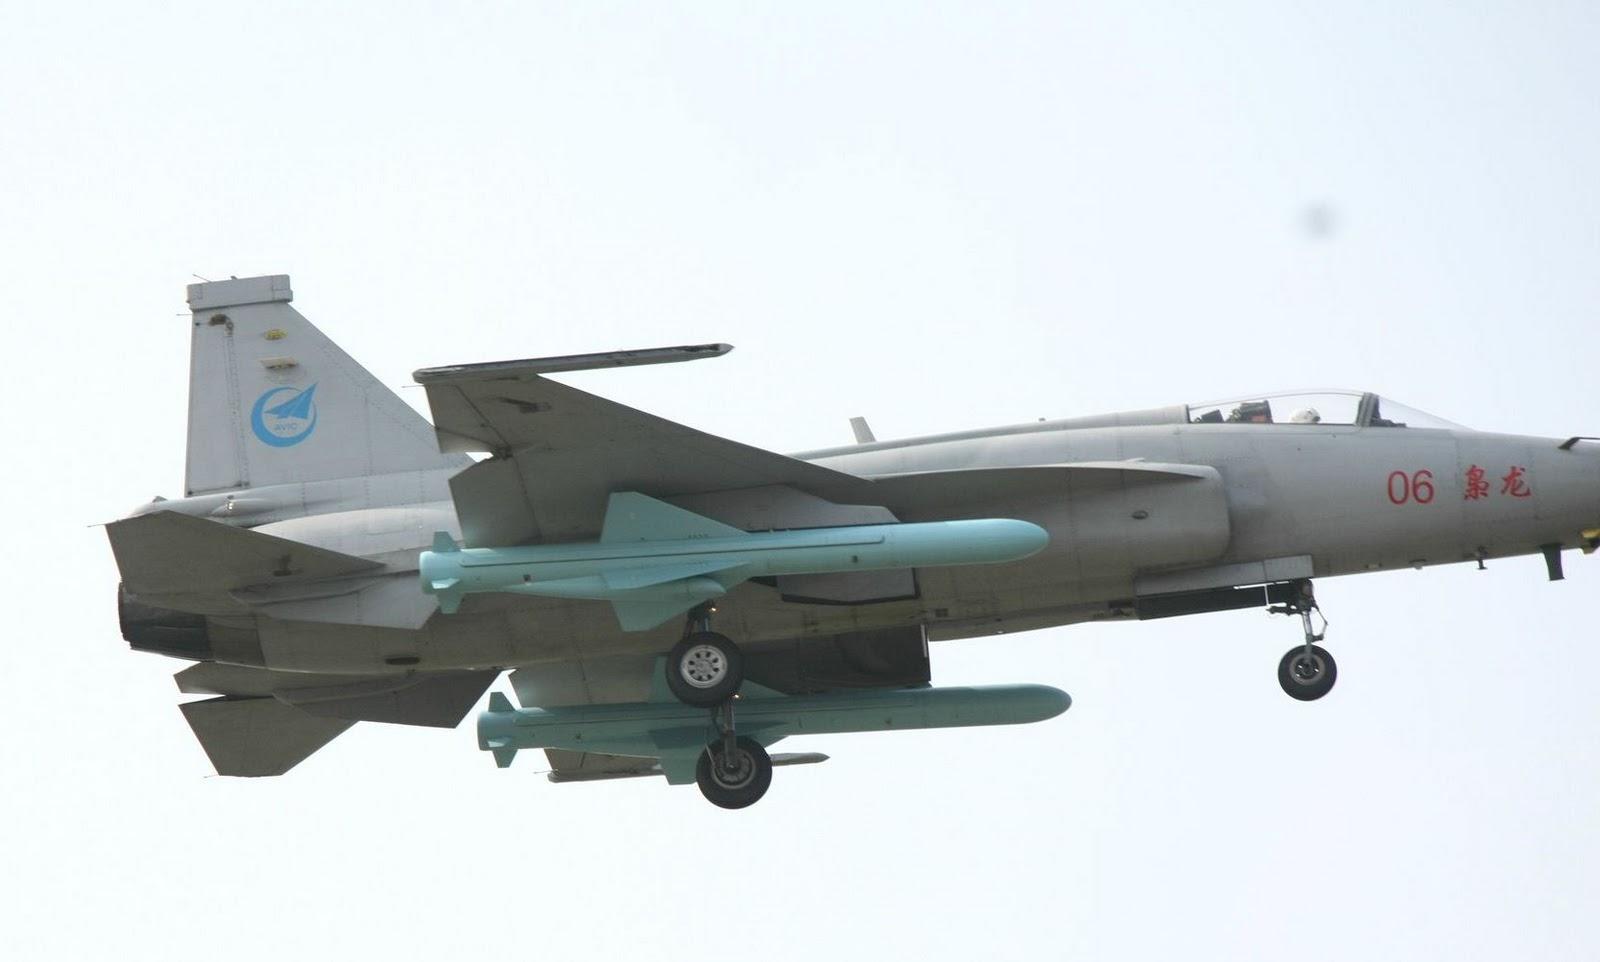 AVIC JF-17 Thunder versus SAAB JAS-39 Gripen - Key